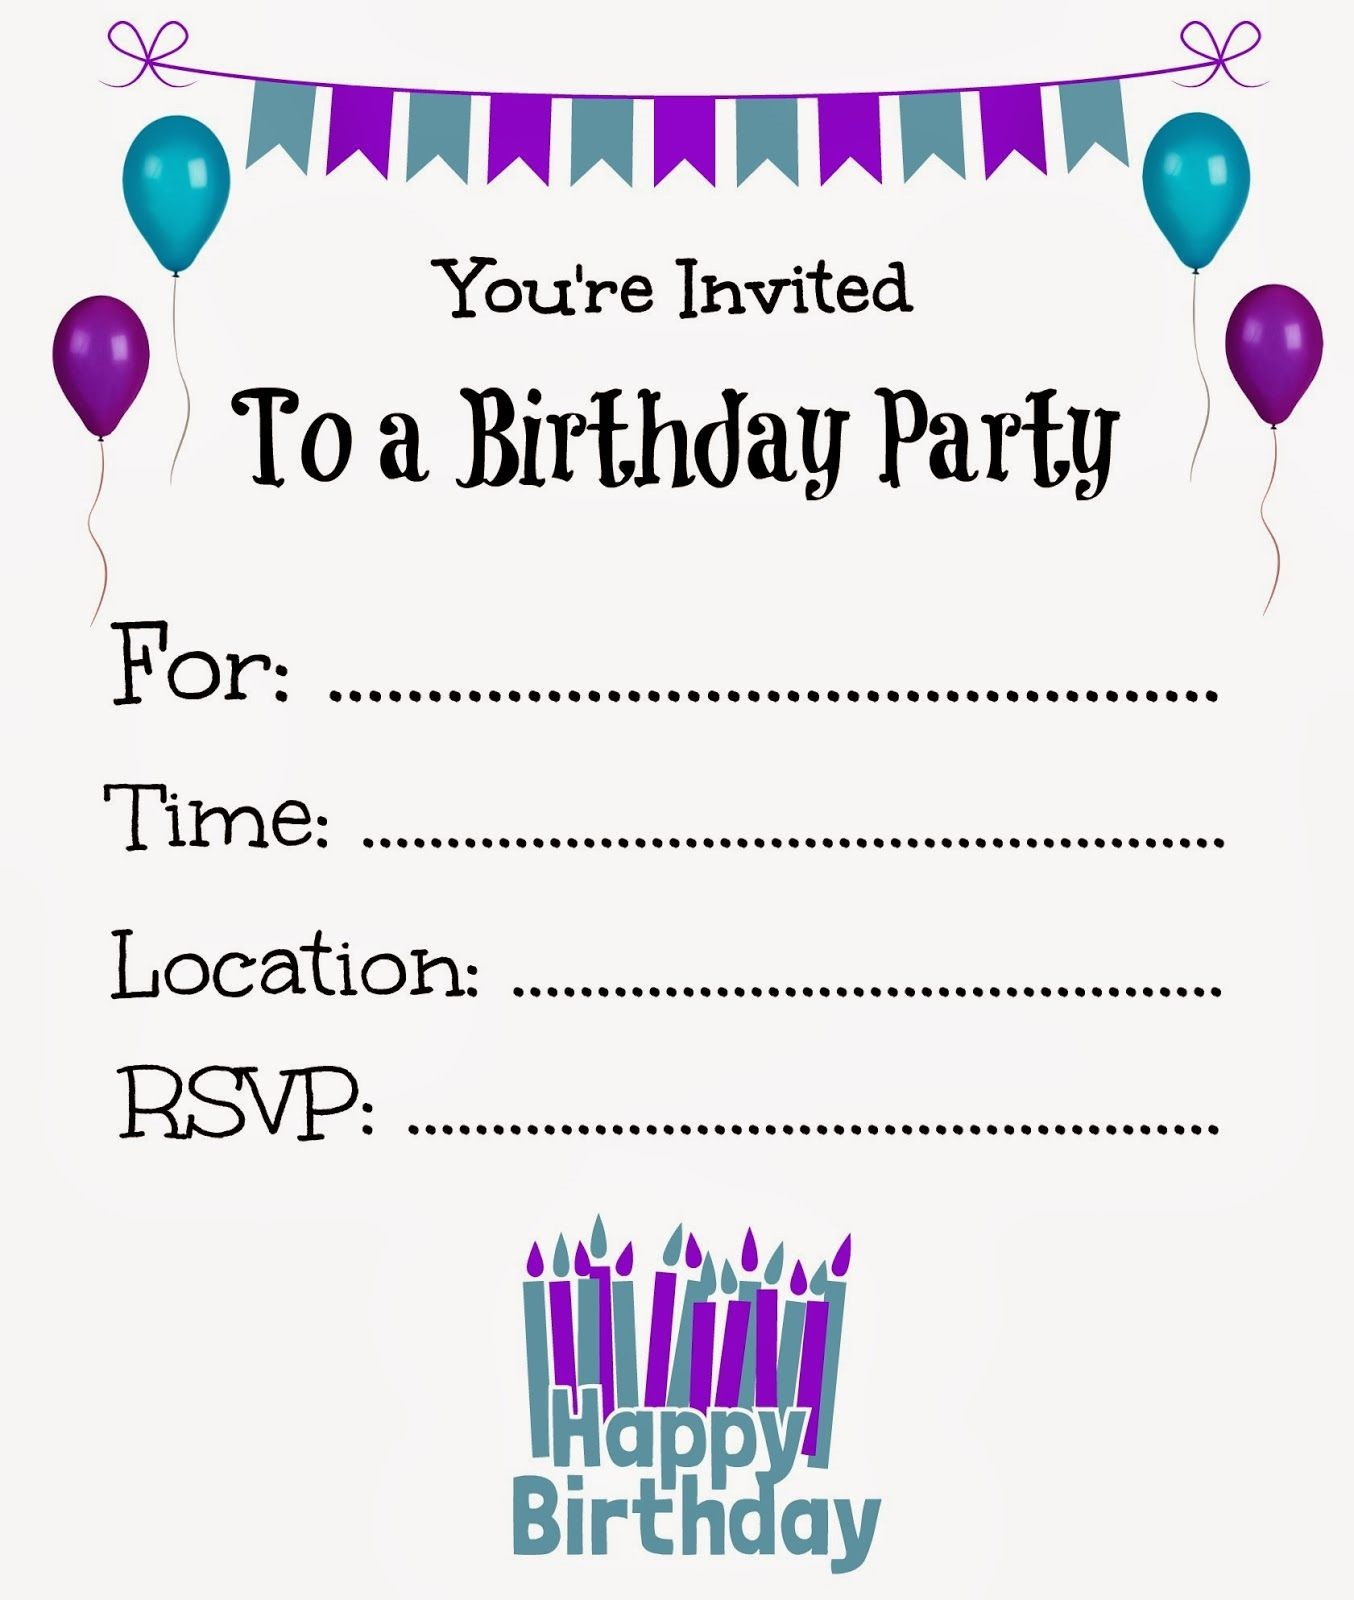 008 Stunning Free Printable Party Invitation Template Design  Templates Beach Spa TeaFull